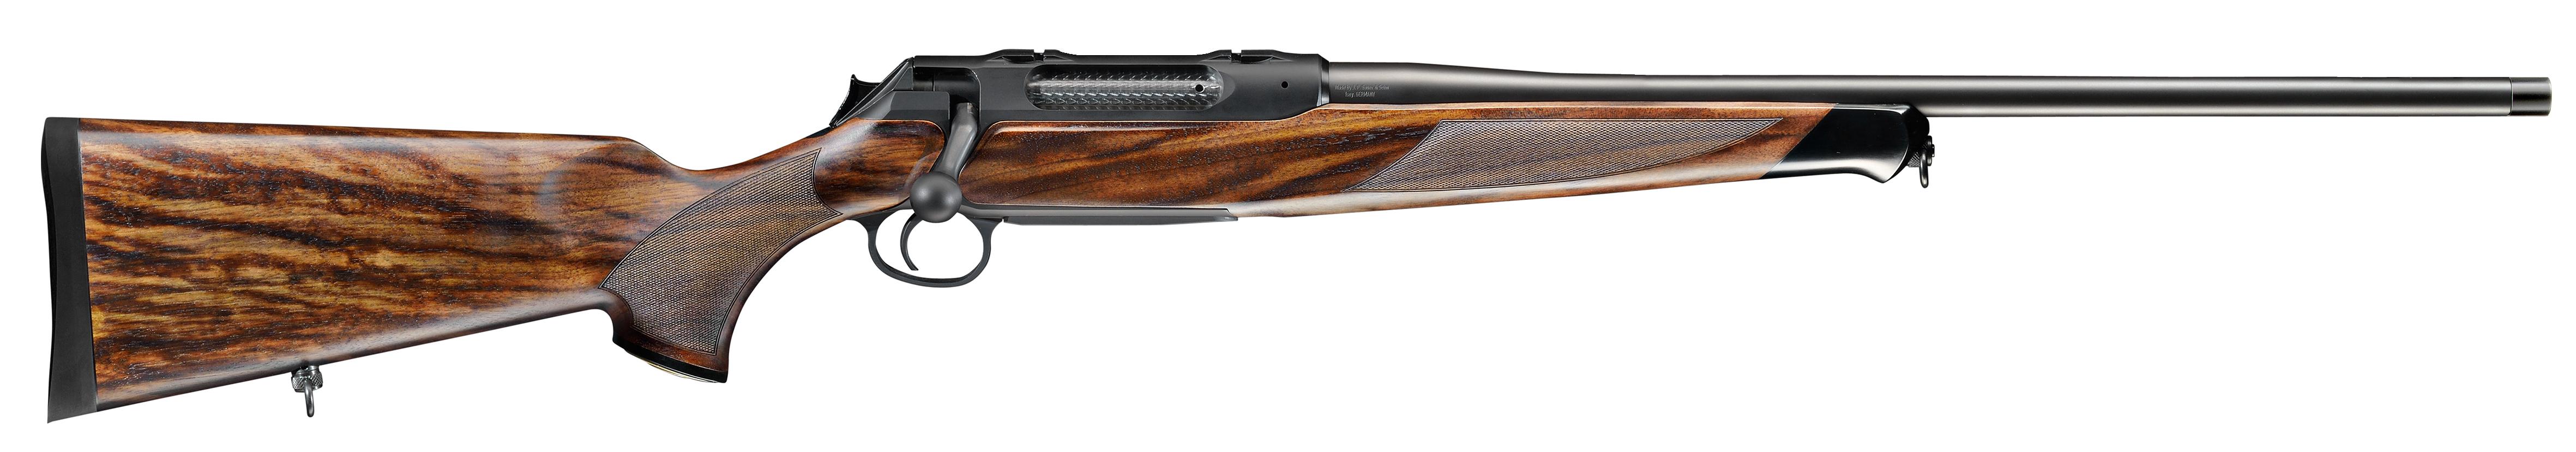 Sauer 404 Select SR 6,5x55 kivääri